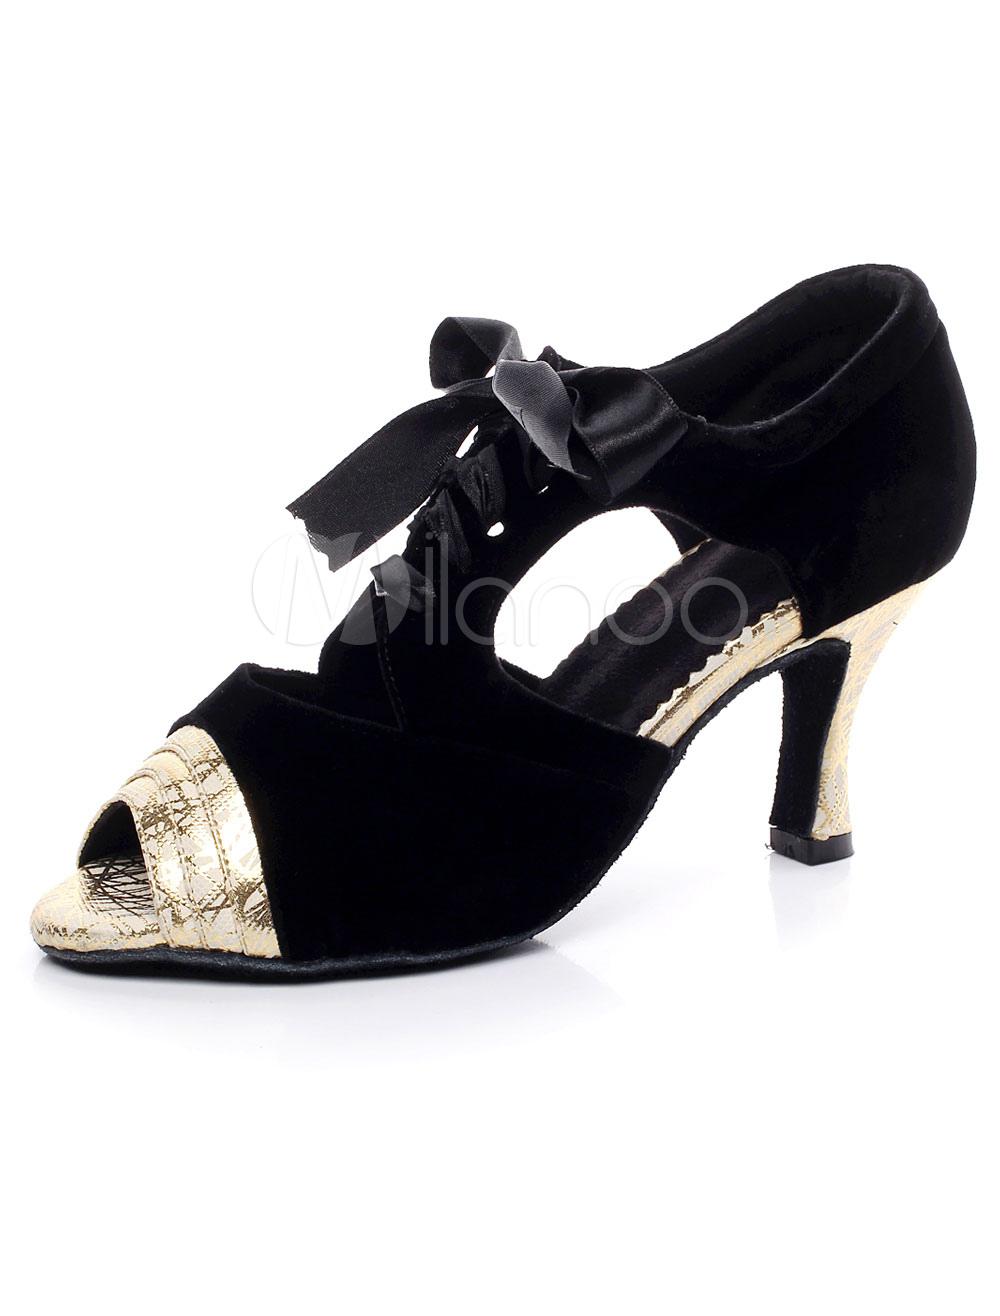 bow peep toe lateinamerikanische t nze sandalen schwarz pu. Black Bedroom Furniture Sets. Home Design Ideas